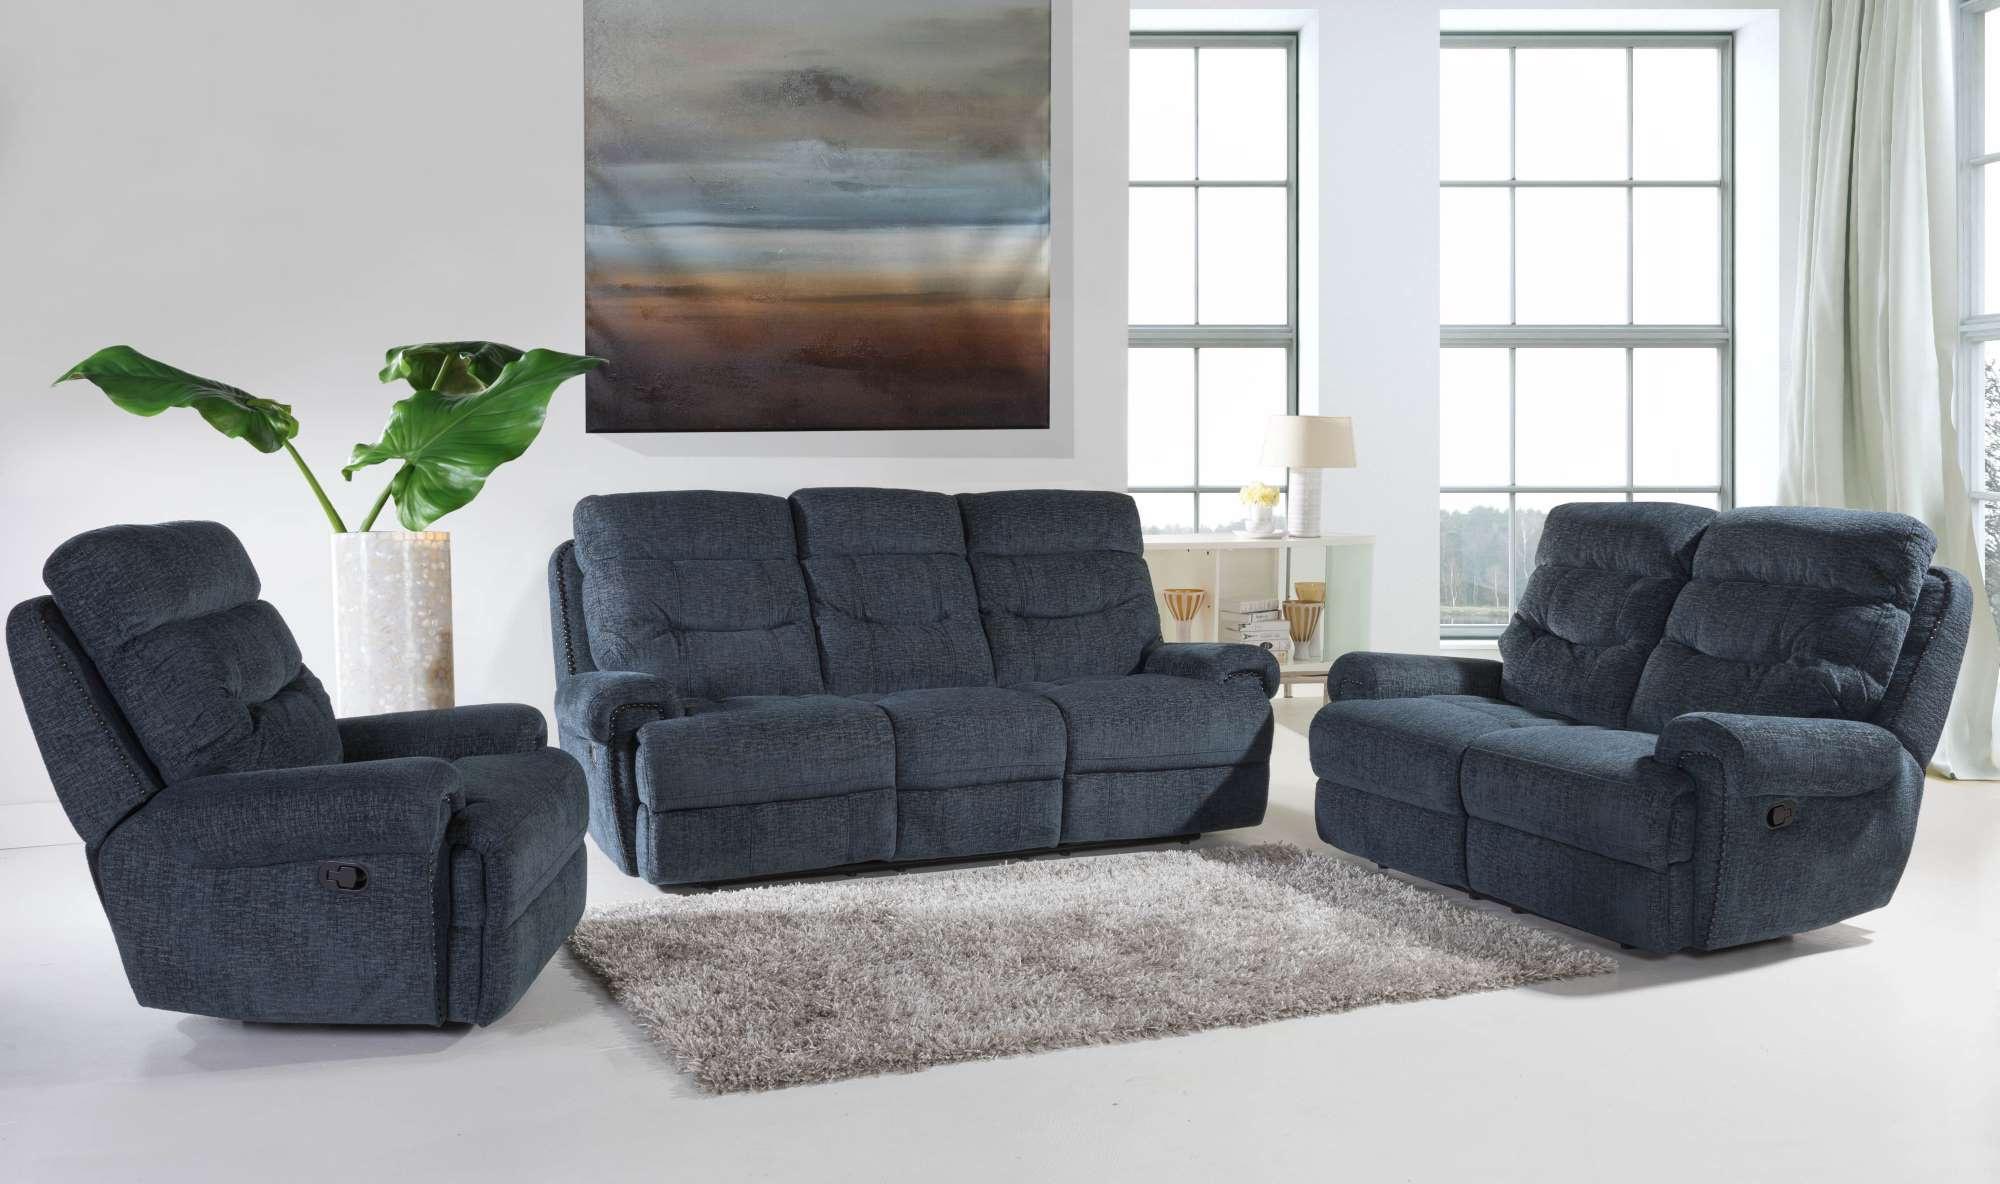 Indigo Reclining Sofa and Loveseat LR6194